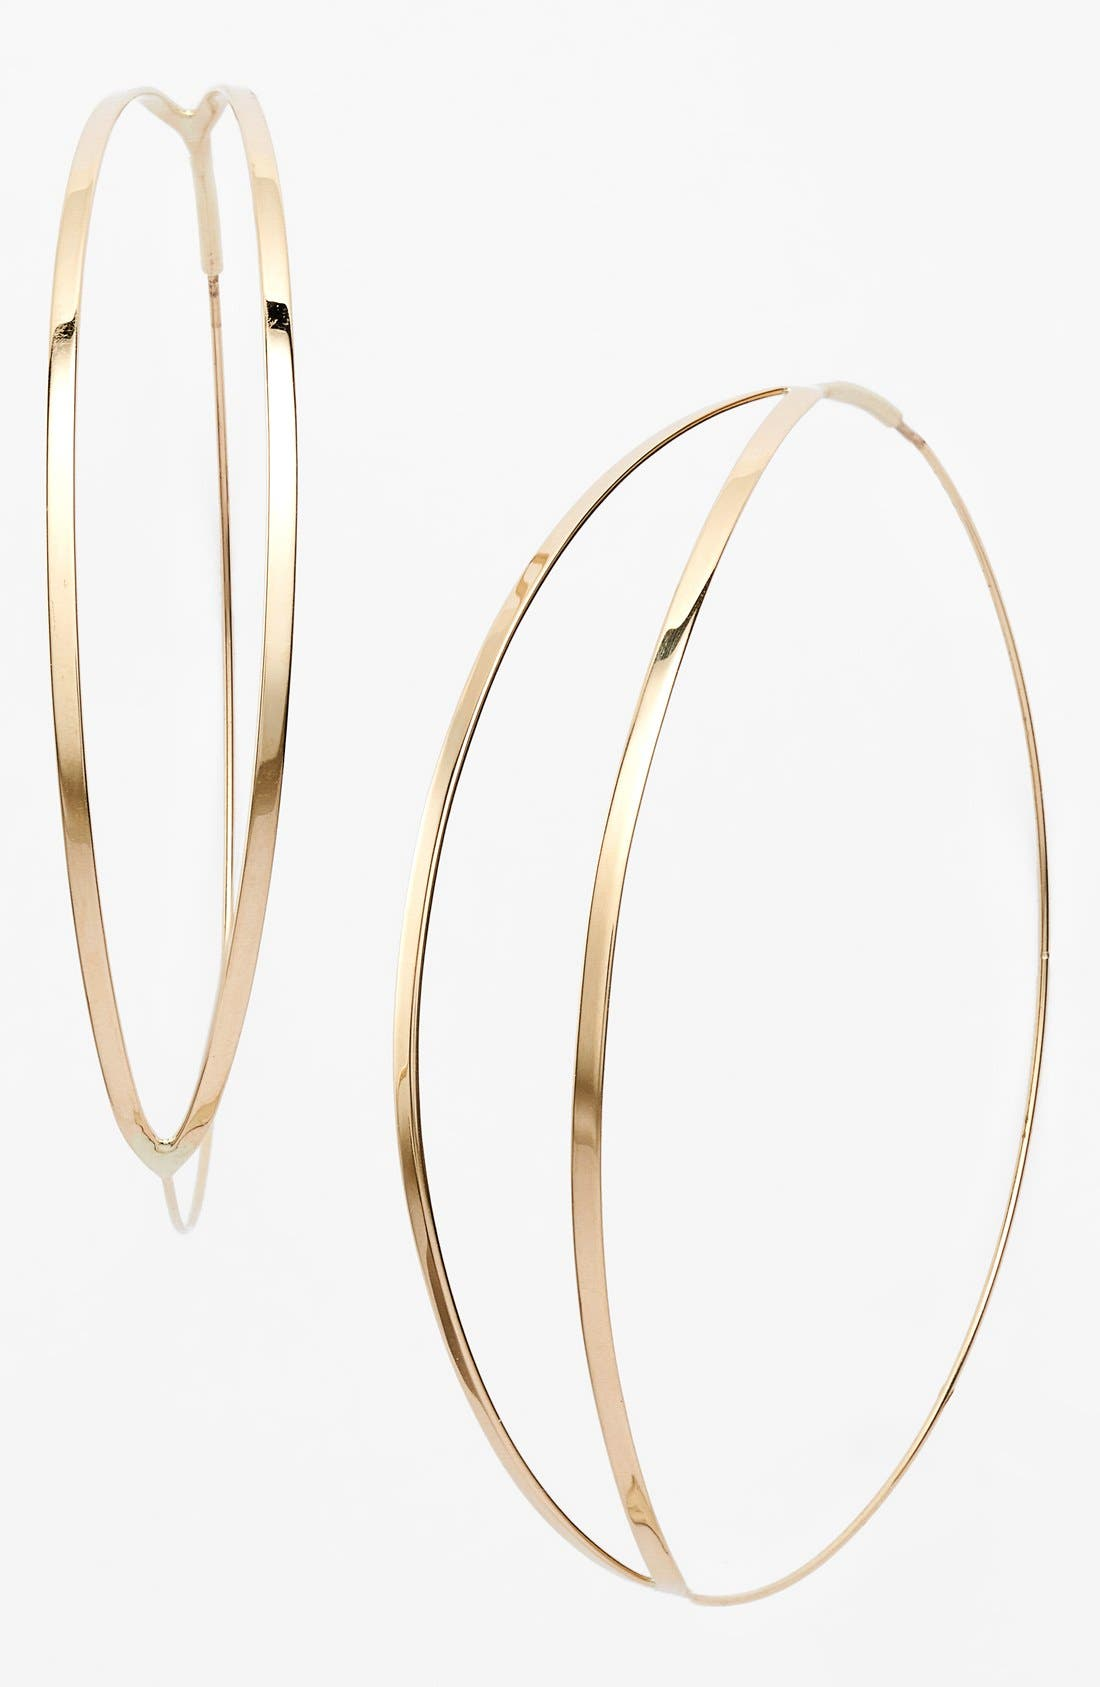 Main Image - Lana Jewelry 'Large Flirt' Hoop Earrings